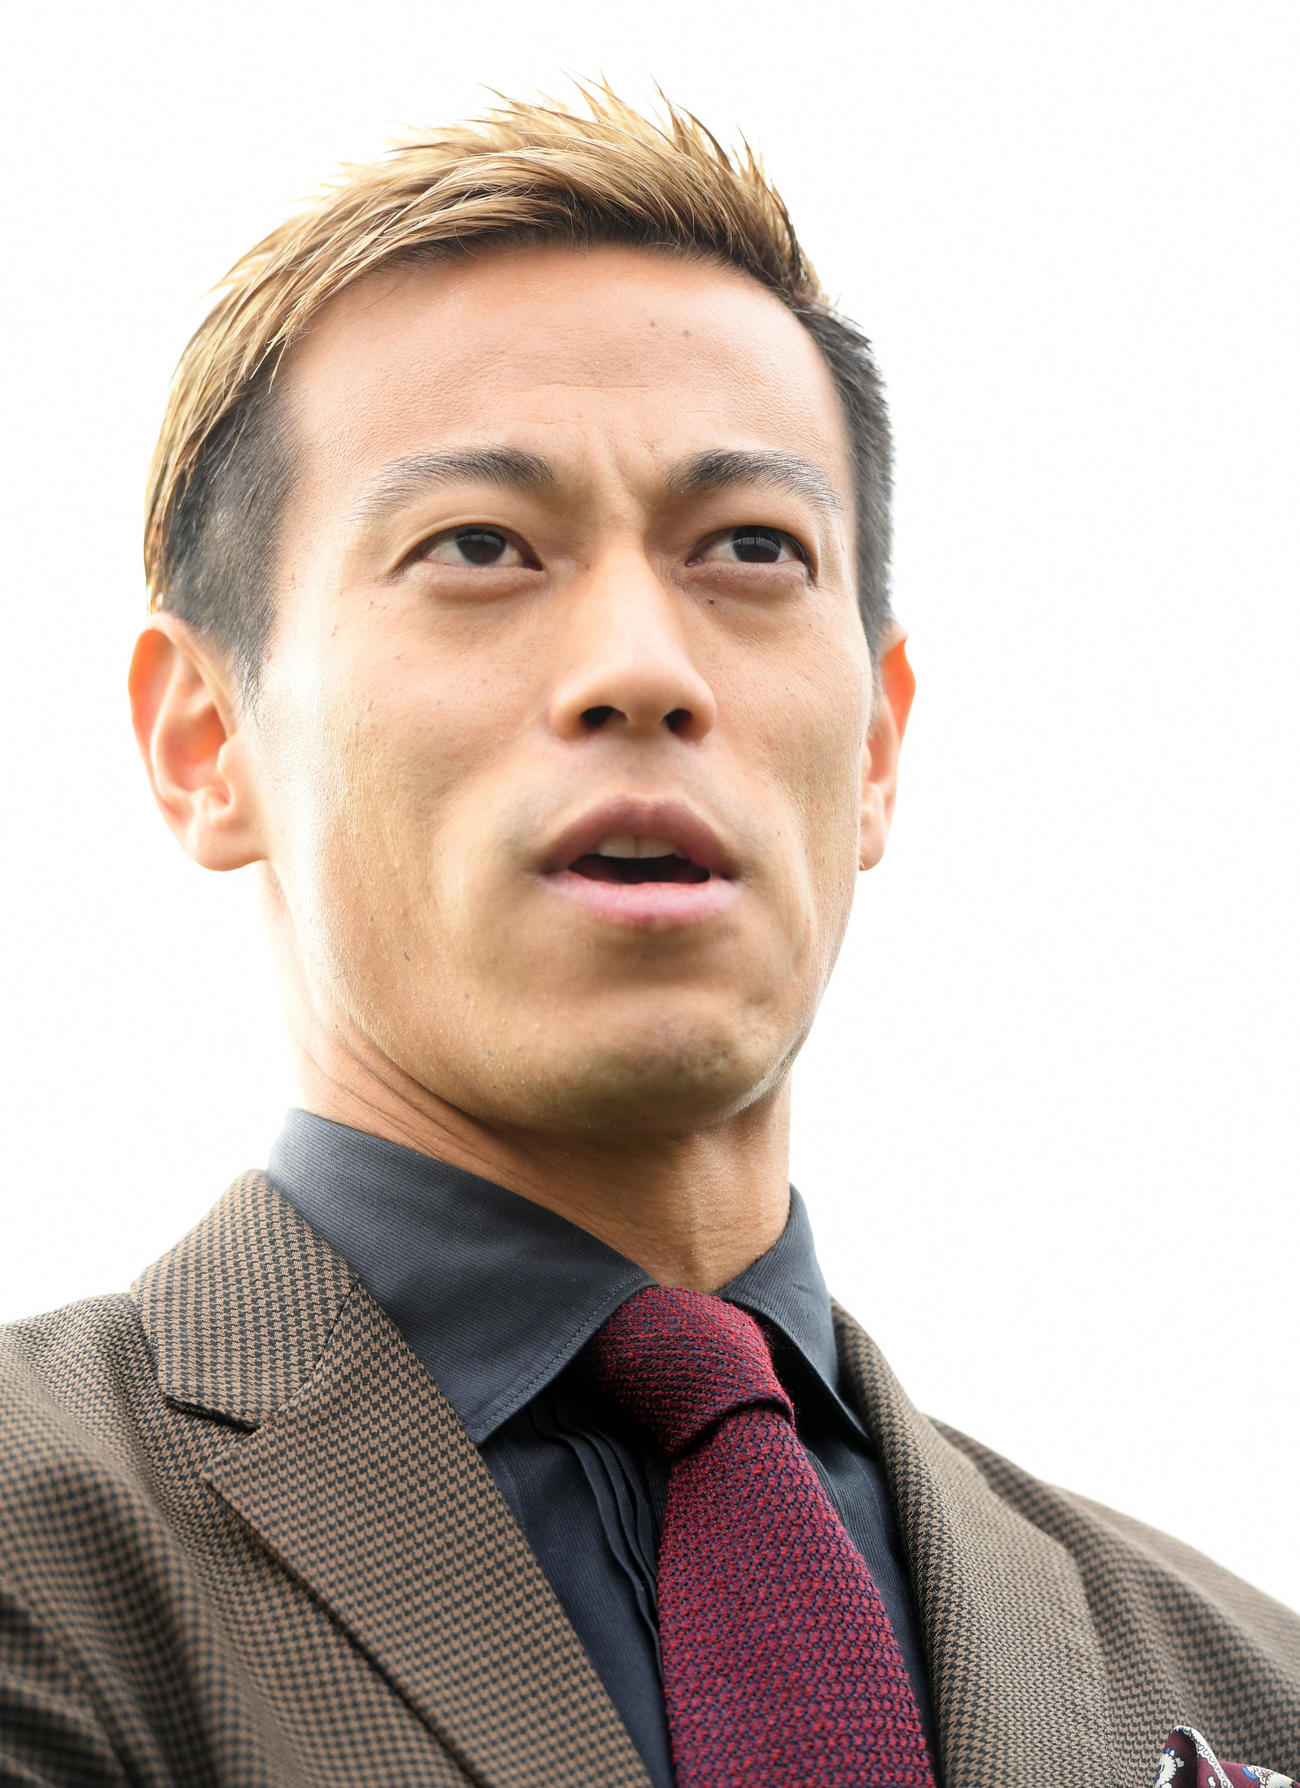 「One Tokyo」設立について語る発起人の本田圭佑(撮影・たえ見朱実)